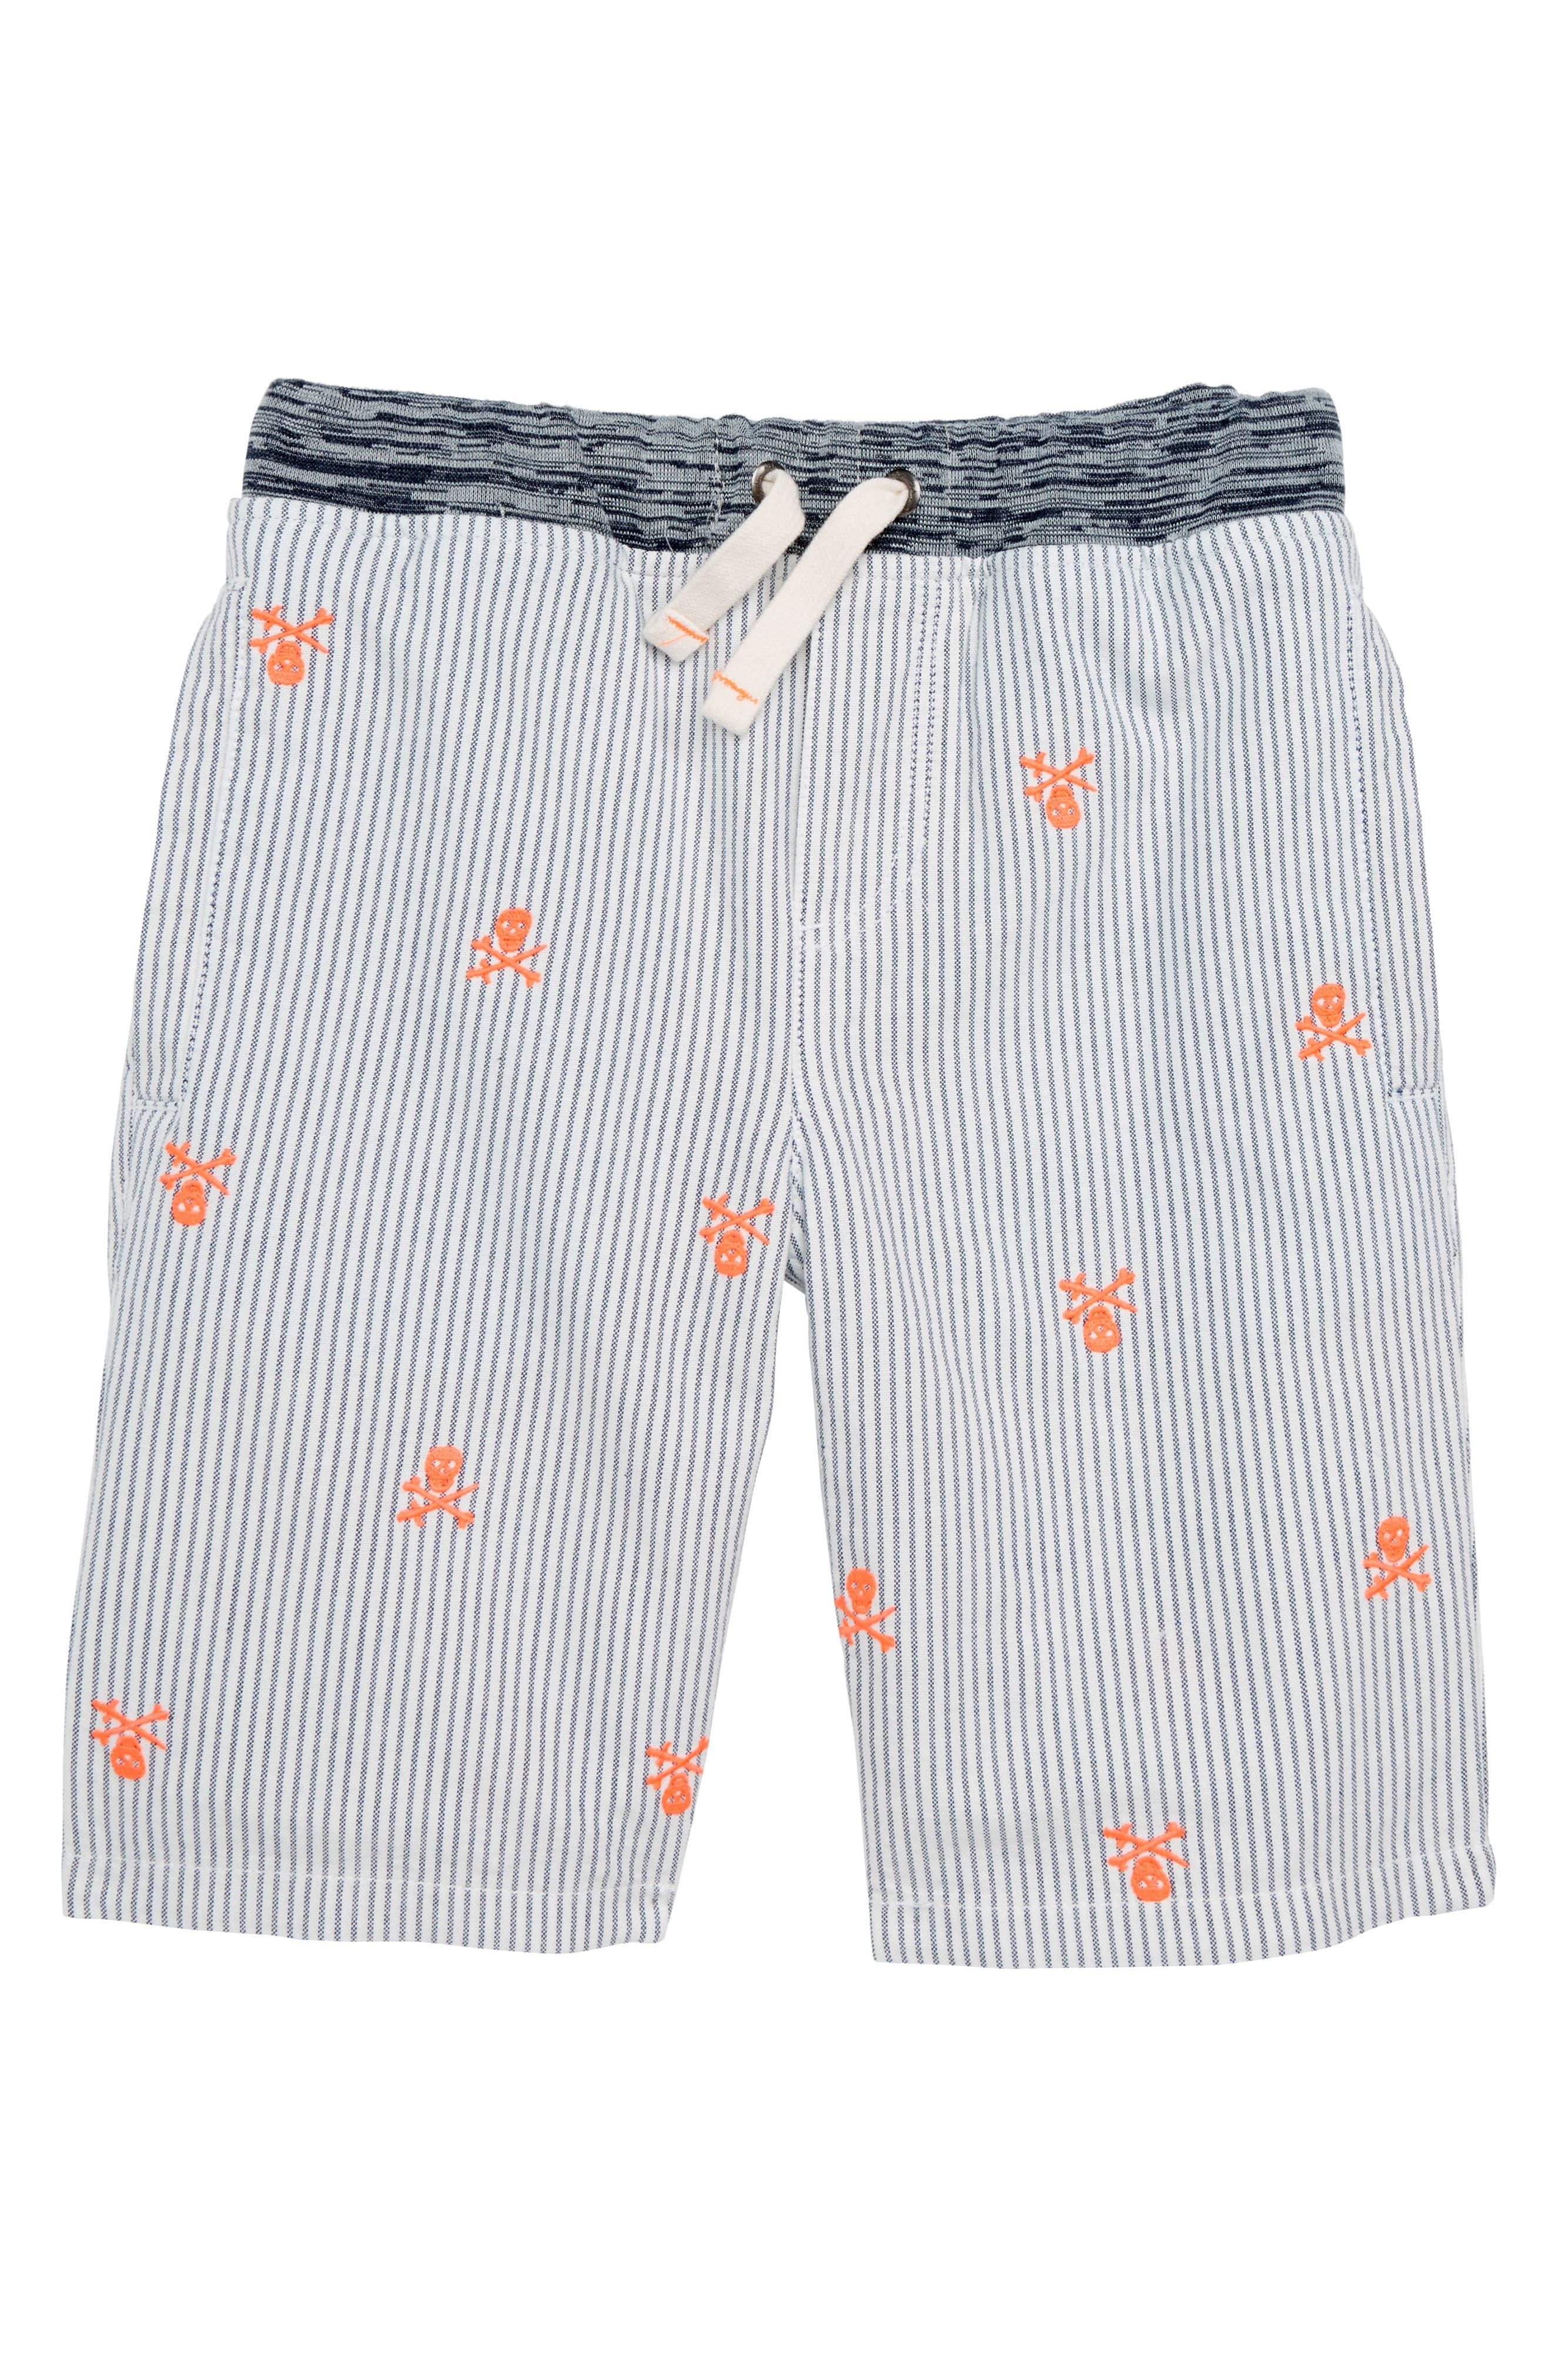 Rib Waist Shorts,                             Main thumbnail 1, color,                             Beacon Blue/ Ecru Skulls